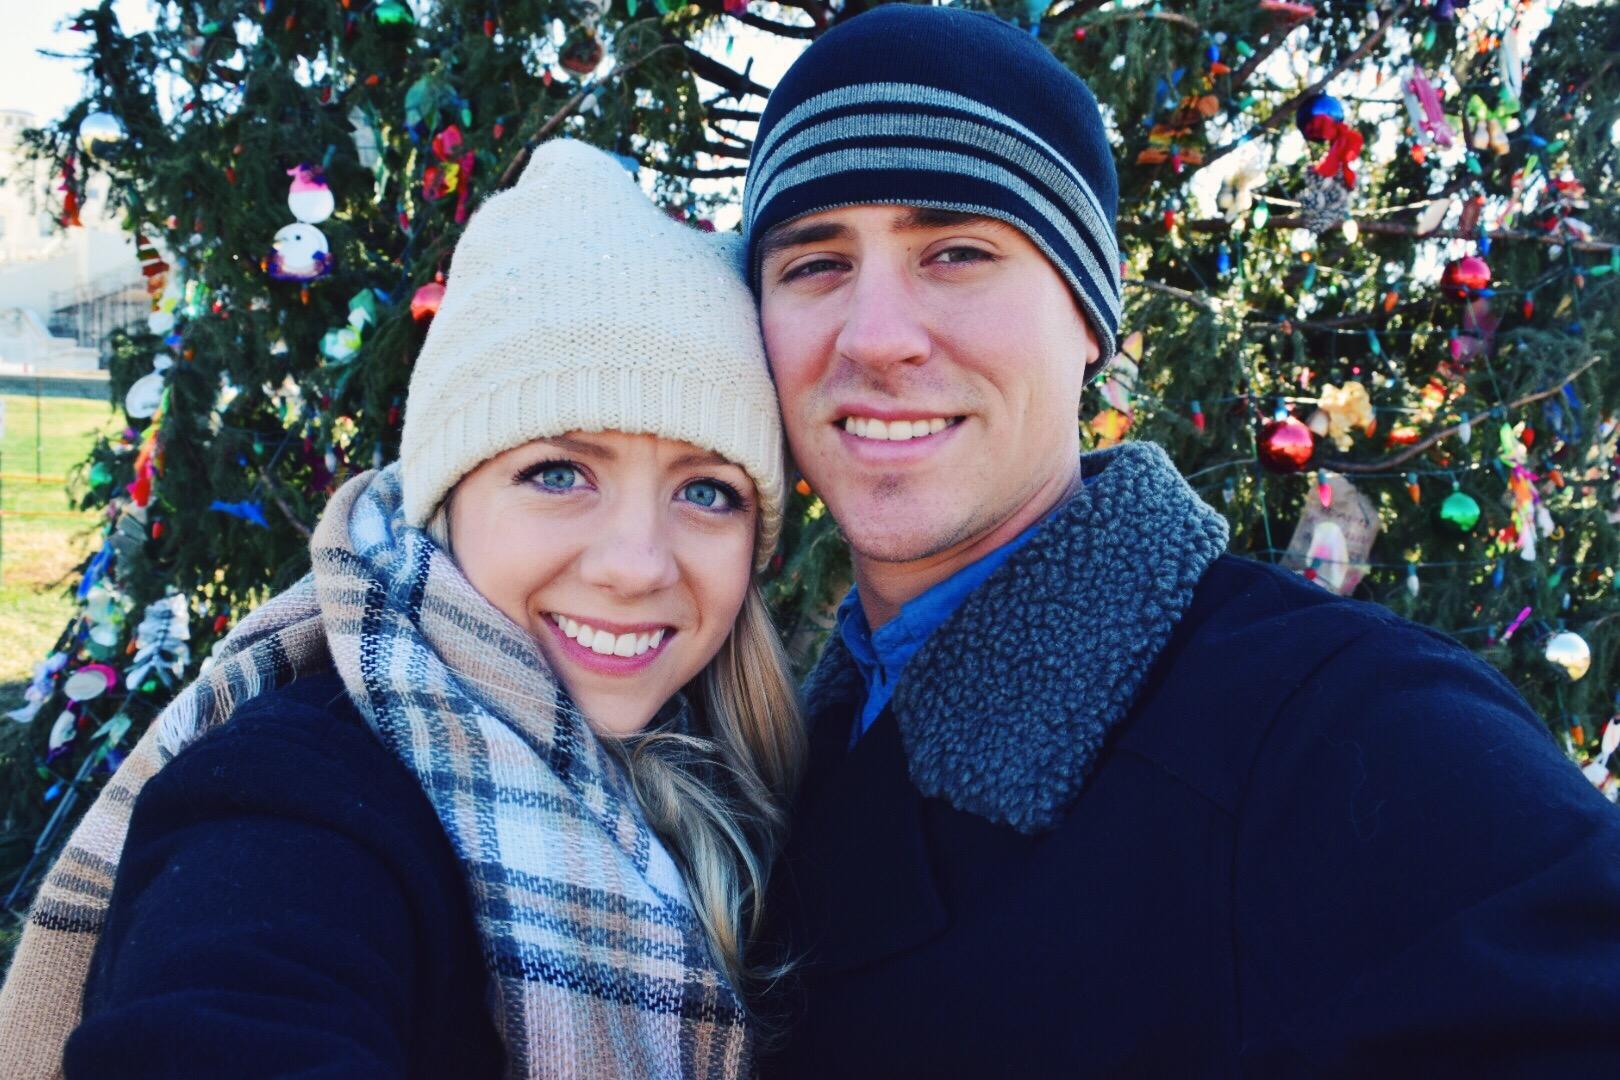 Houston Lifestyle Blogger - 6 Ways to Get Into the Holiday Spirit (5).JPG